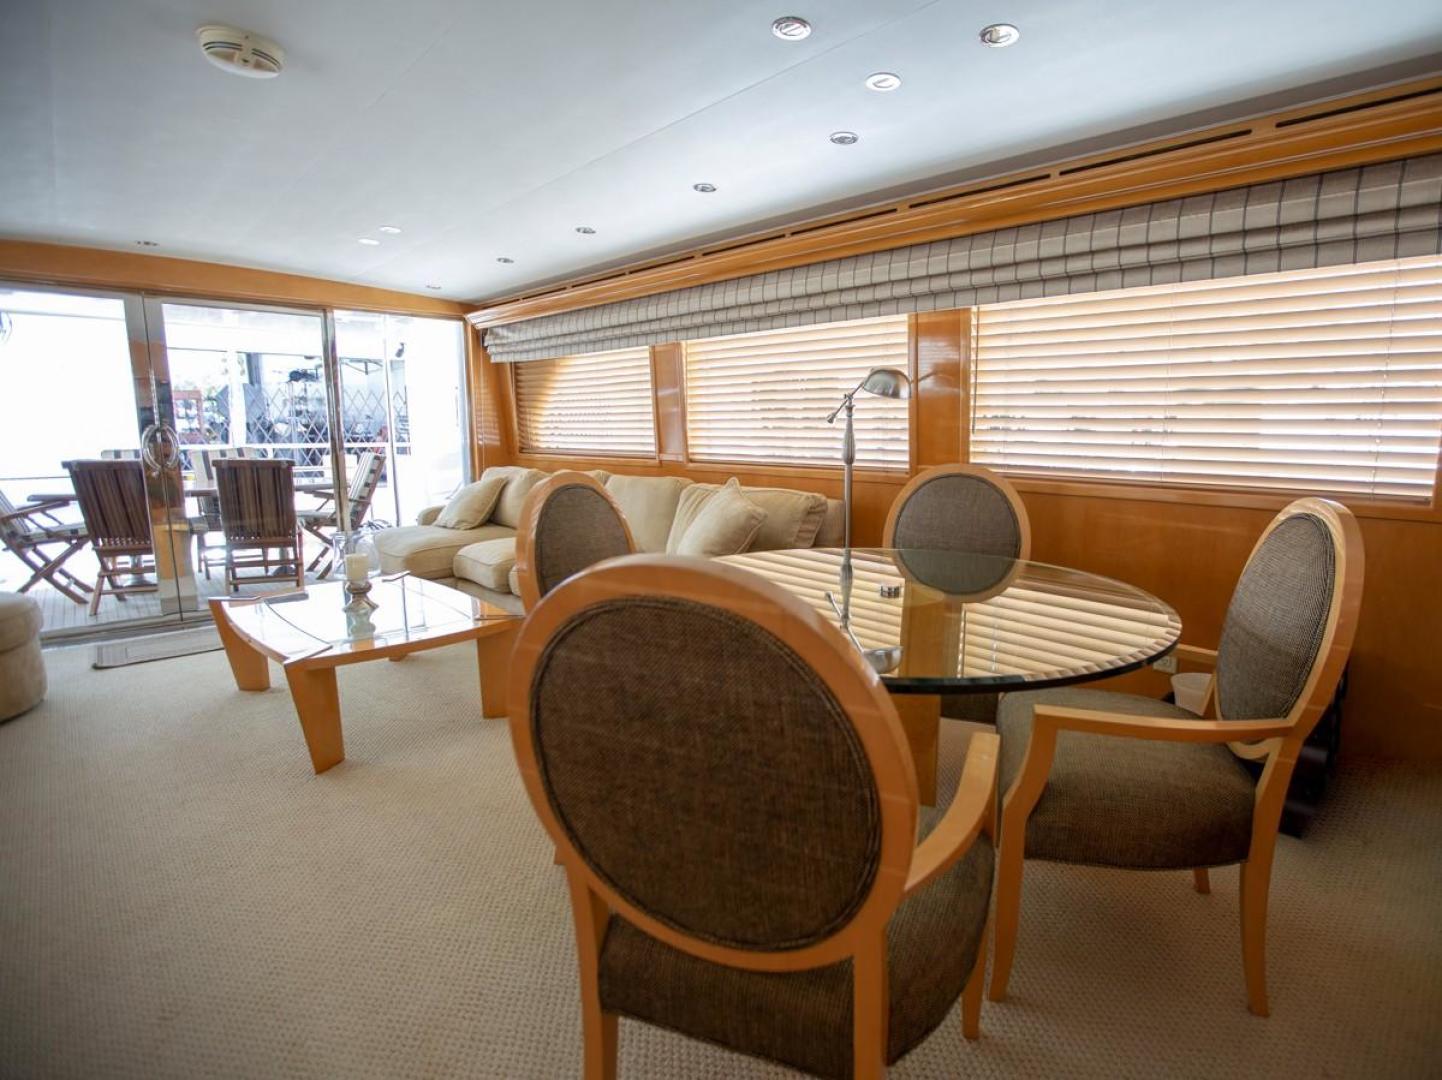 Hatteras-Cockpit Motor Yacht 2000-Getaway Ft. Lauderdale-Florida-United States-977363 | Thumbnail